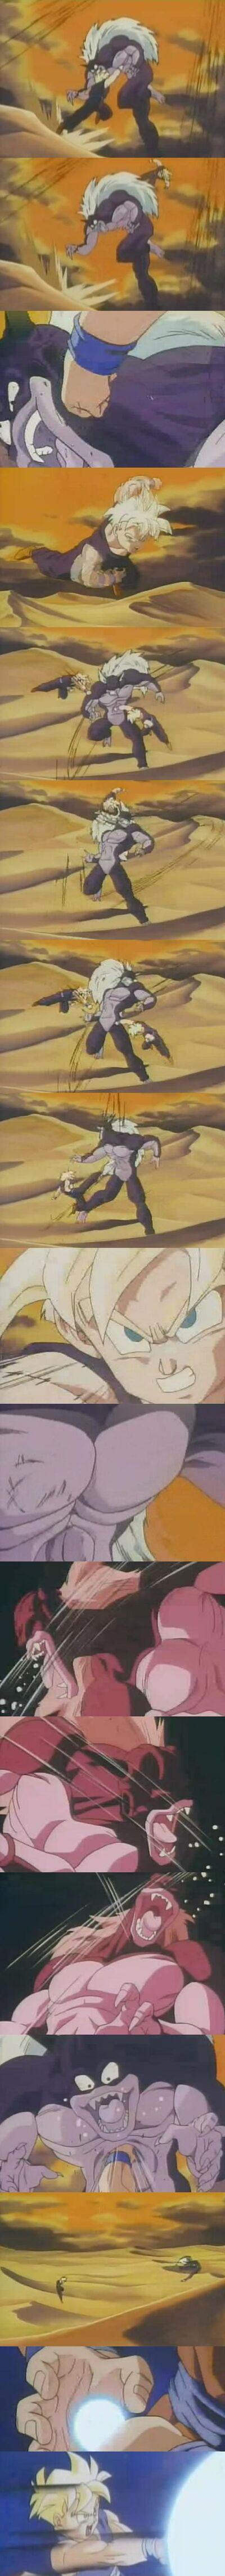 Gohan Teen Super Saiyan super 25